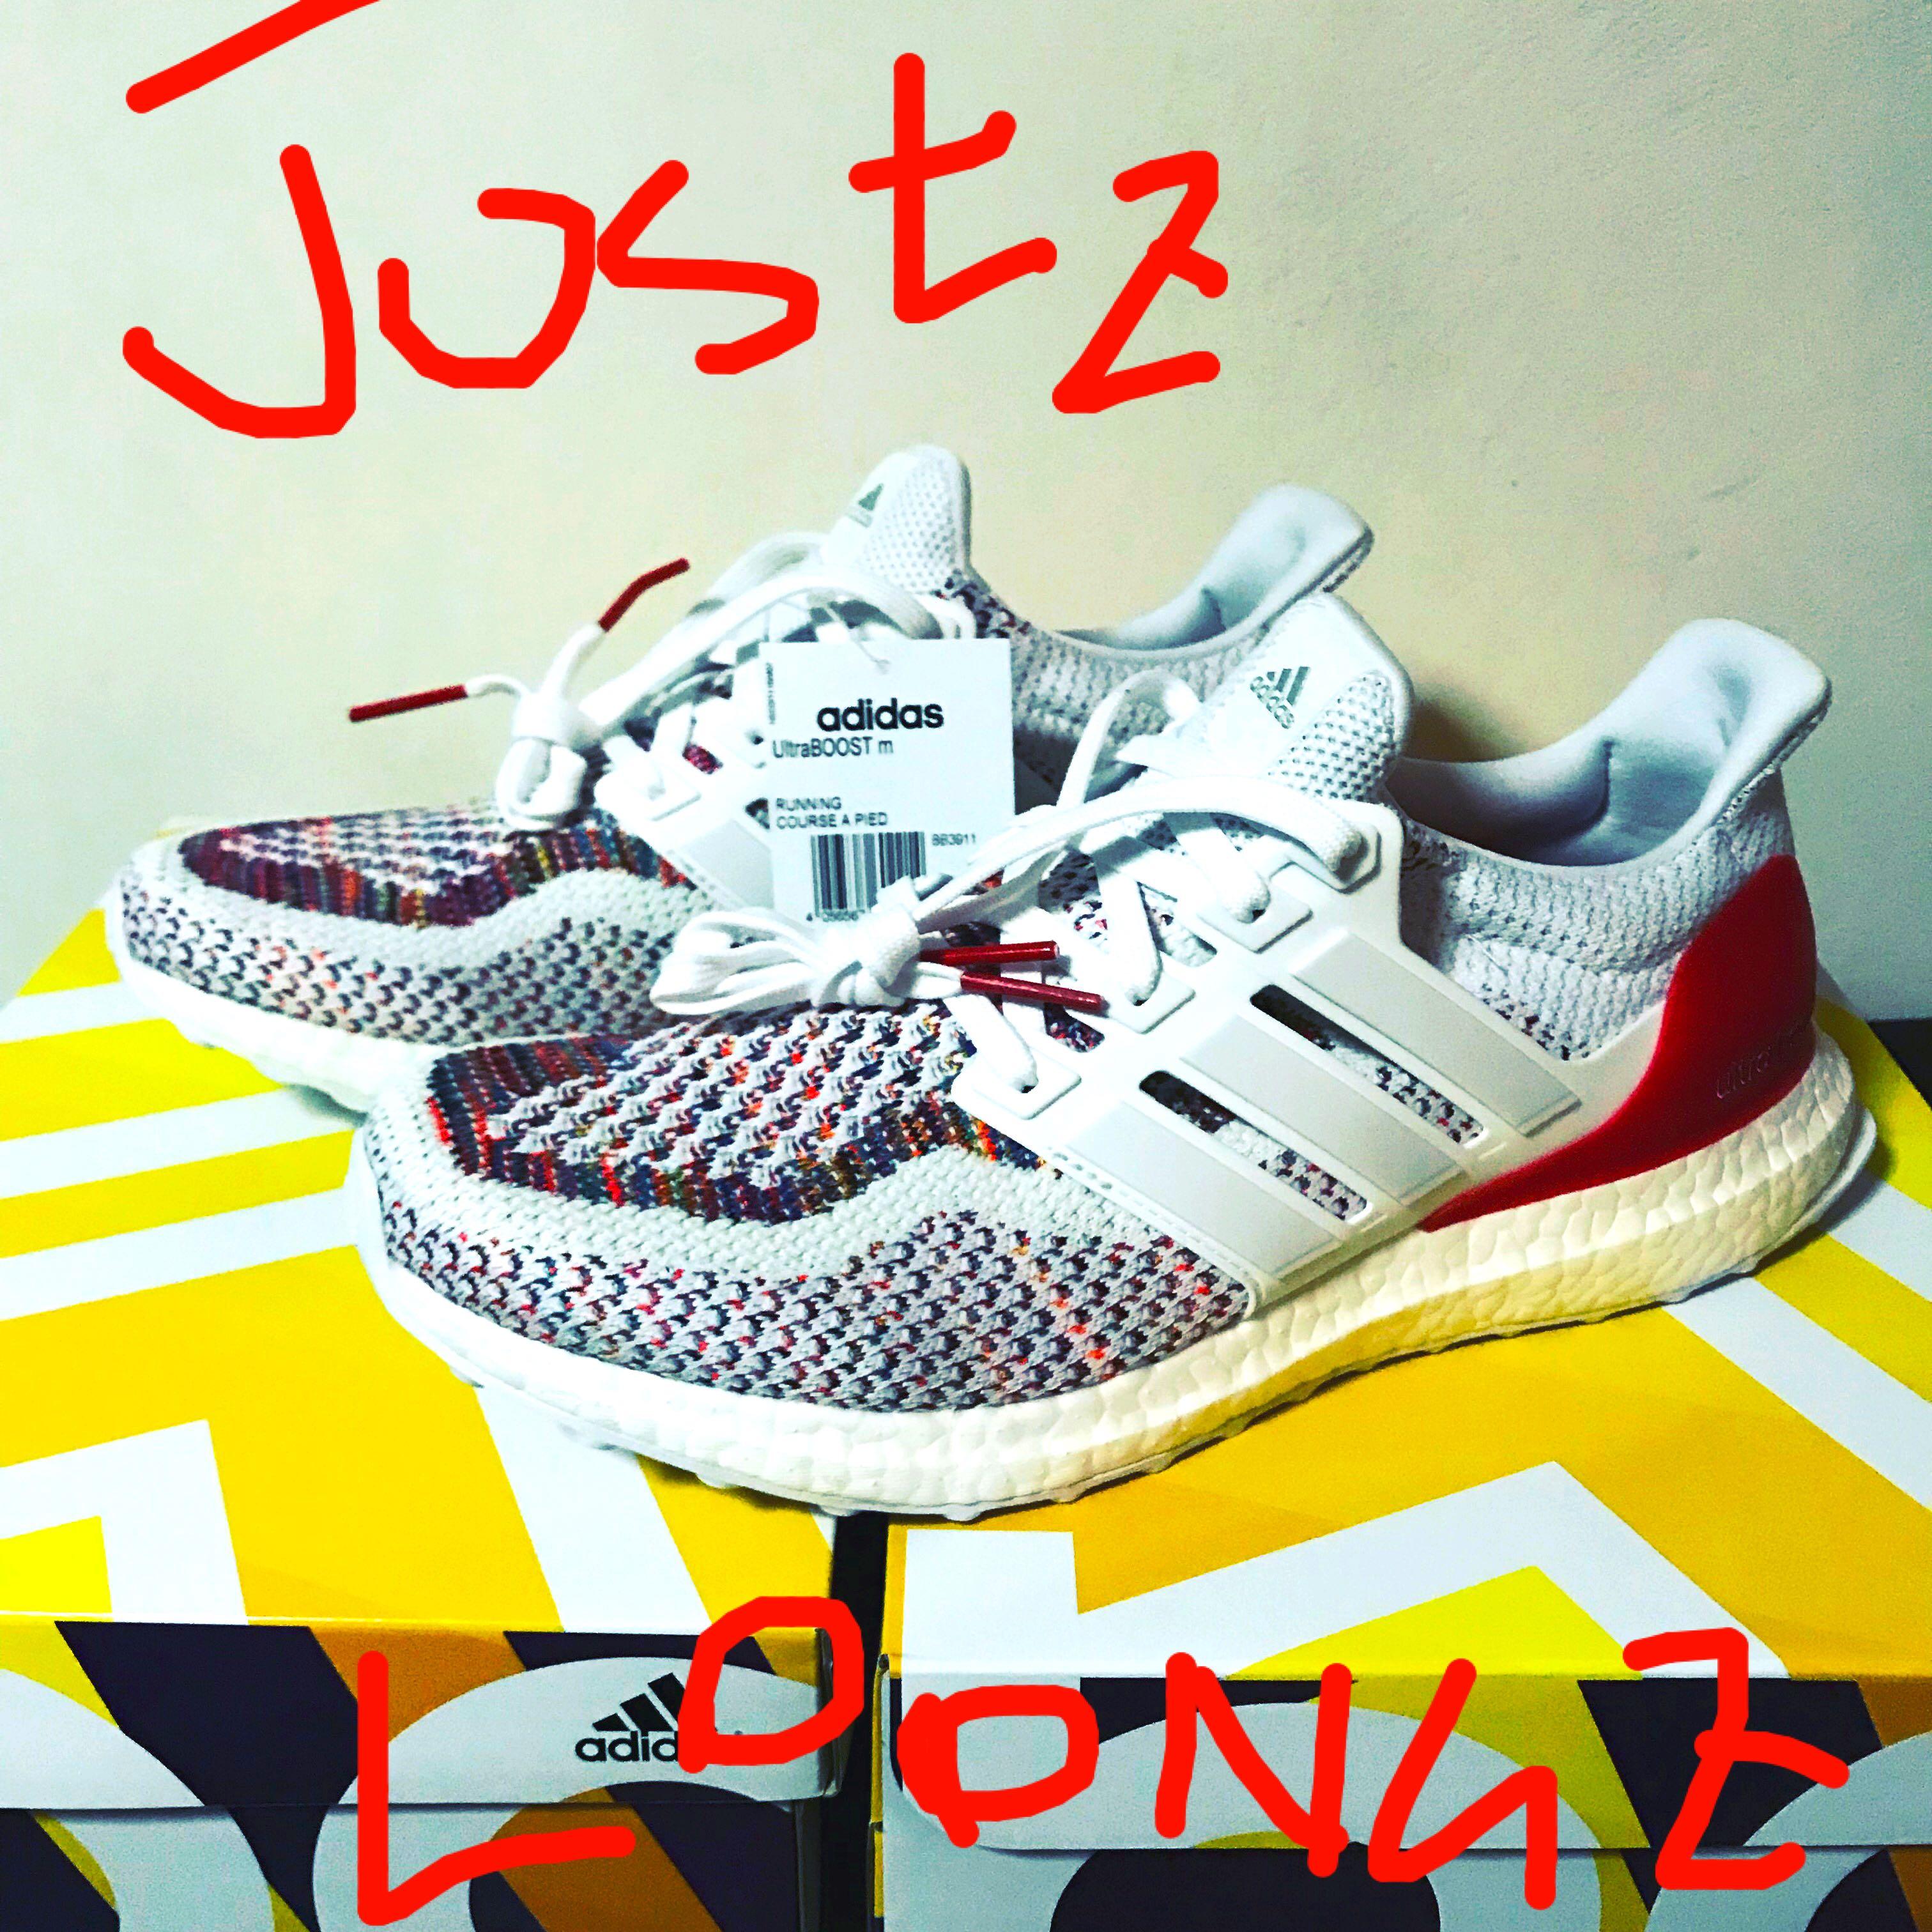 sports shoes 7f075 55722 BNIB Adidas Ultraboost multicolour 2.0 uk6.5 us7, Mens Fashion, Footwear,  Sneakers on Carousell